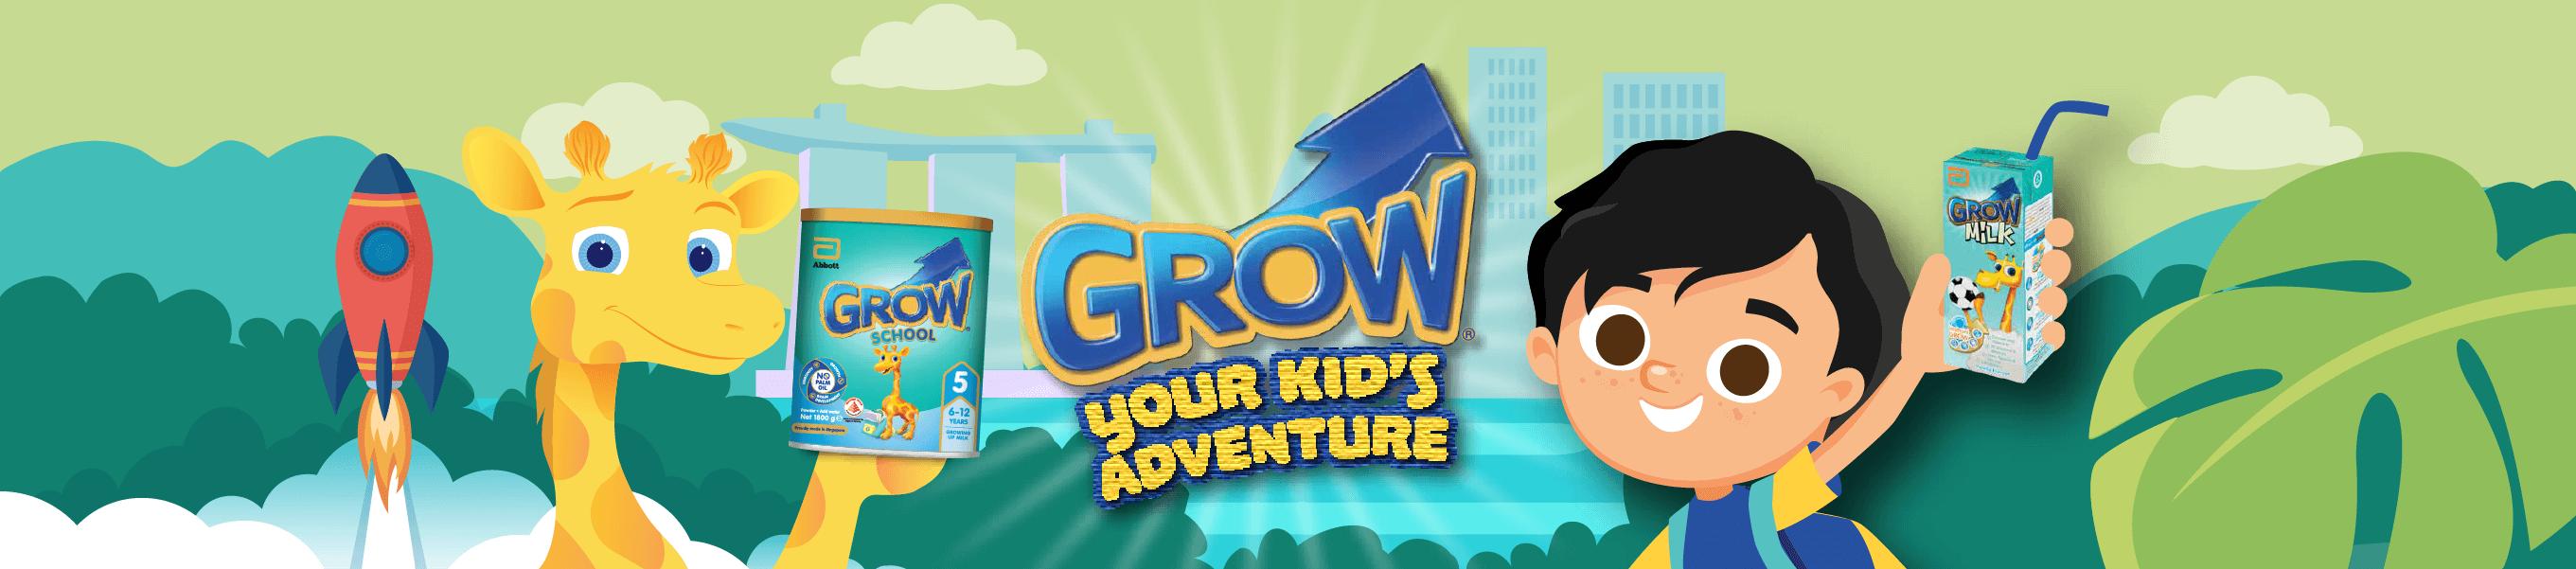 grow-landing-banner.png